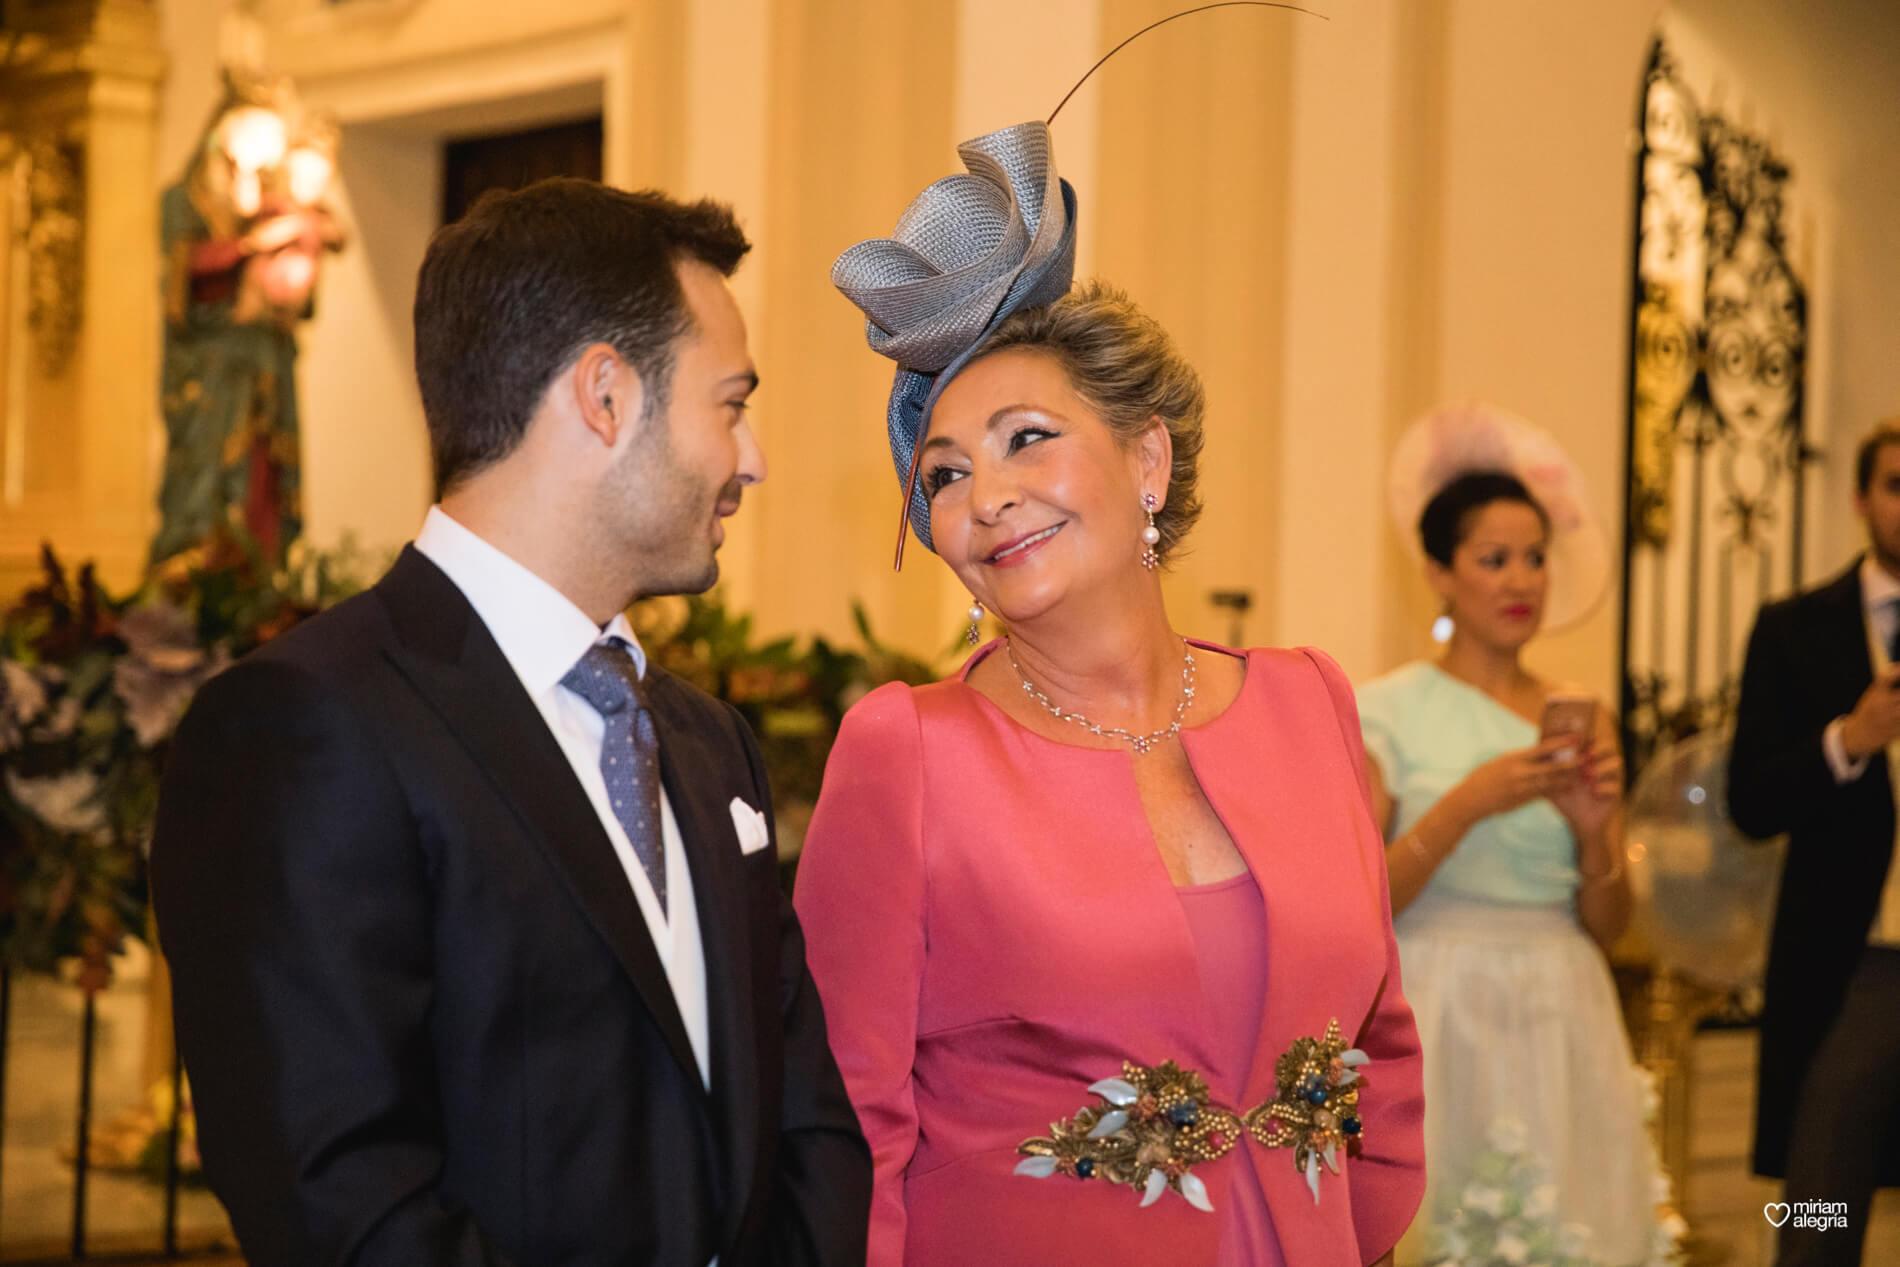 vestido-de-novia-paula-del-vas-miriam-alegria-fotografos-boda-murcia-42